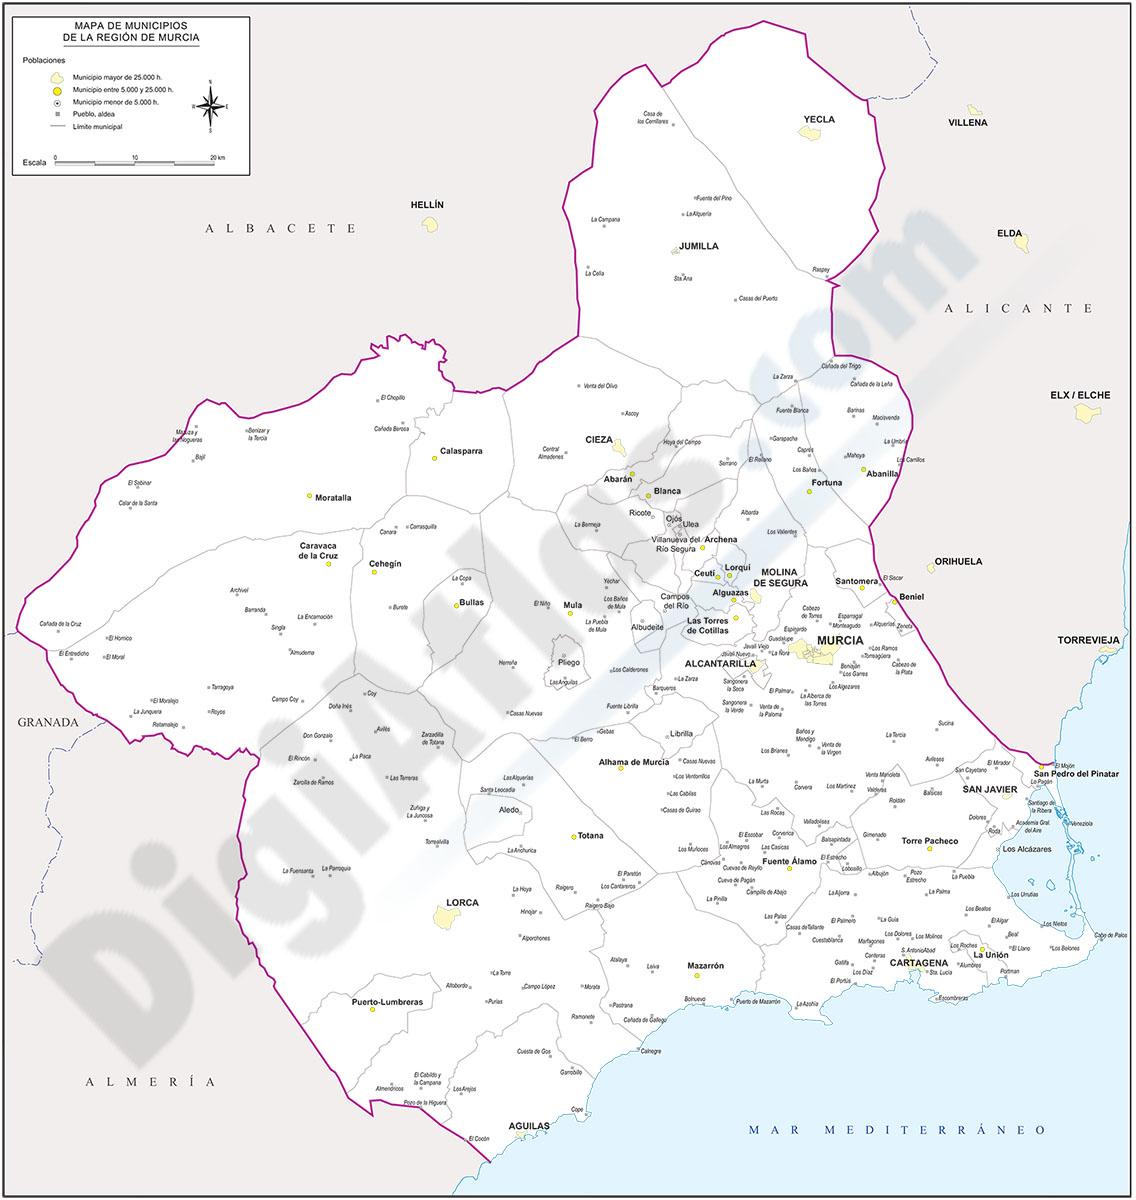 Mapa de Murcia con términos municipales